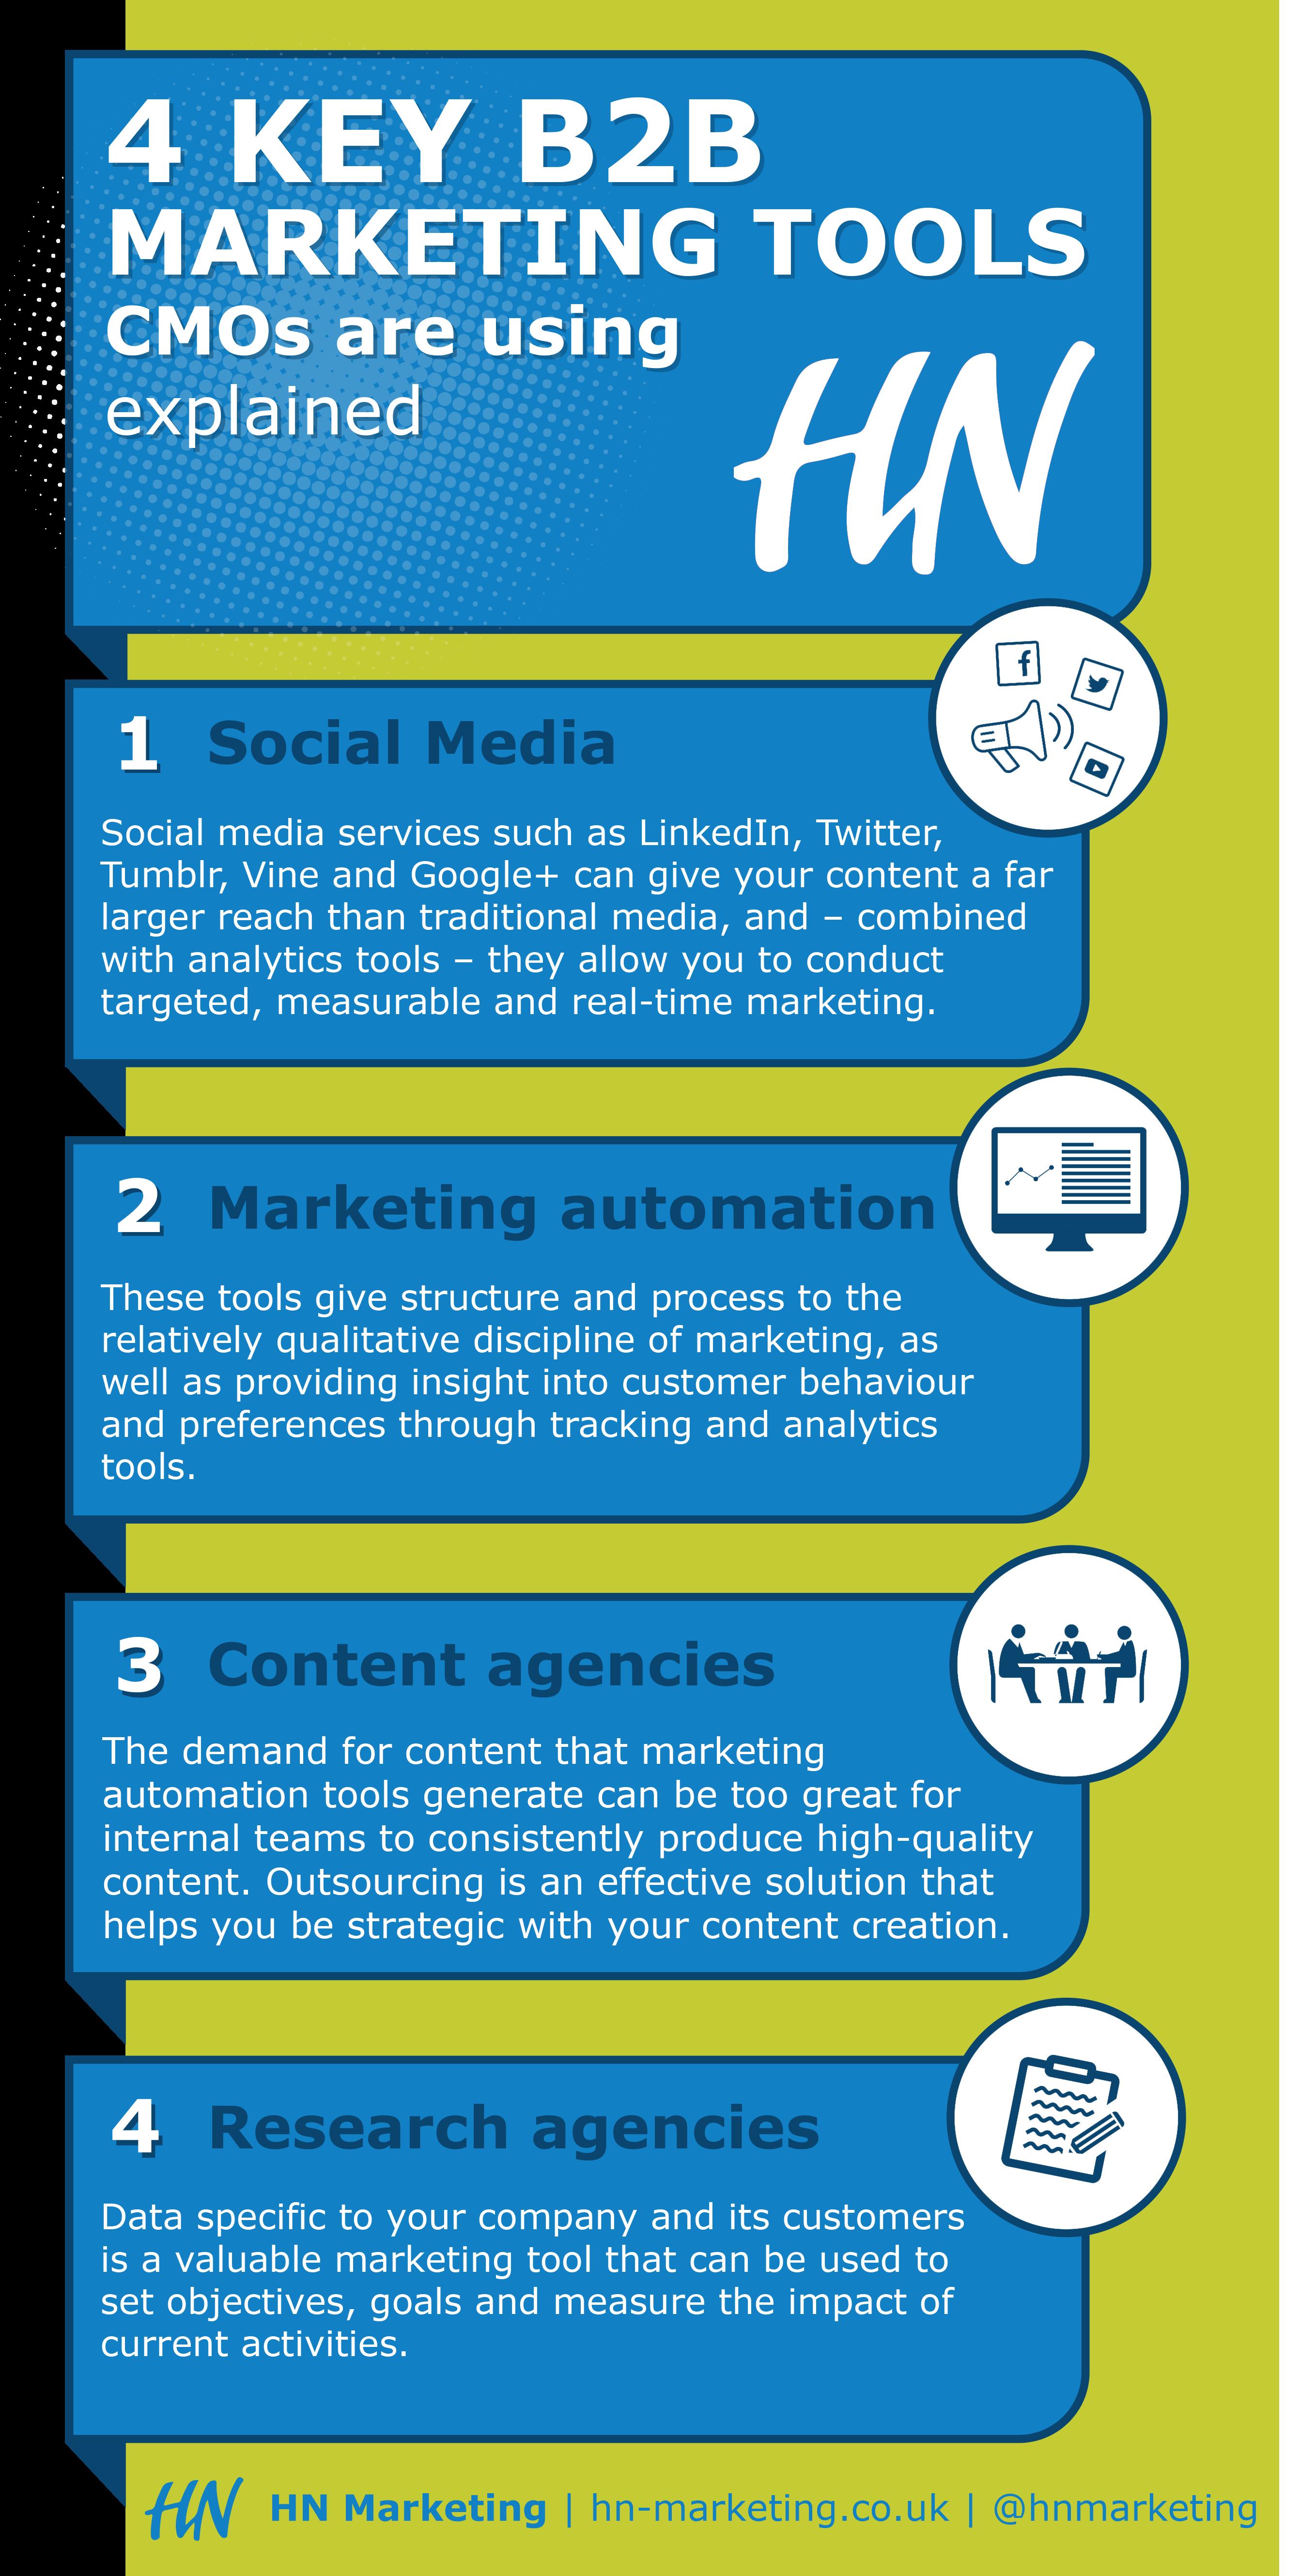 4-key-B2B-marketing-tools